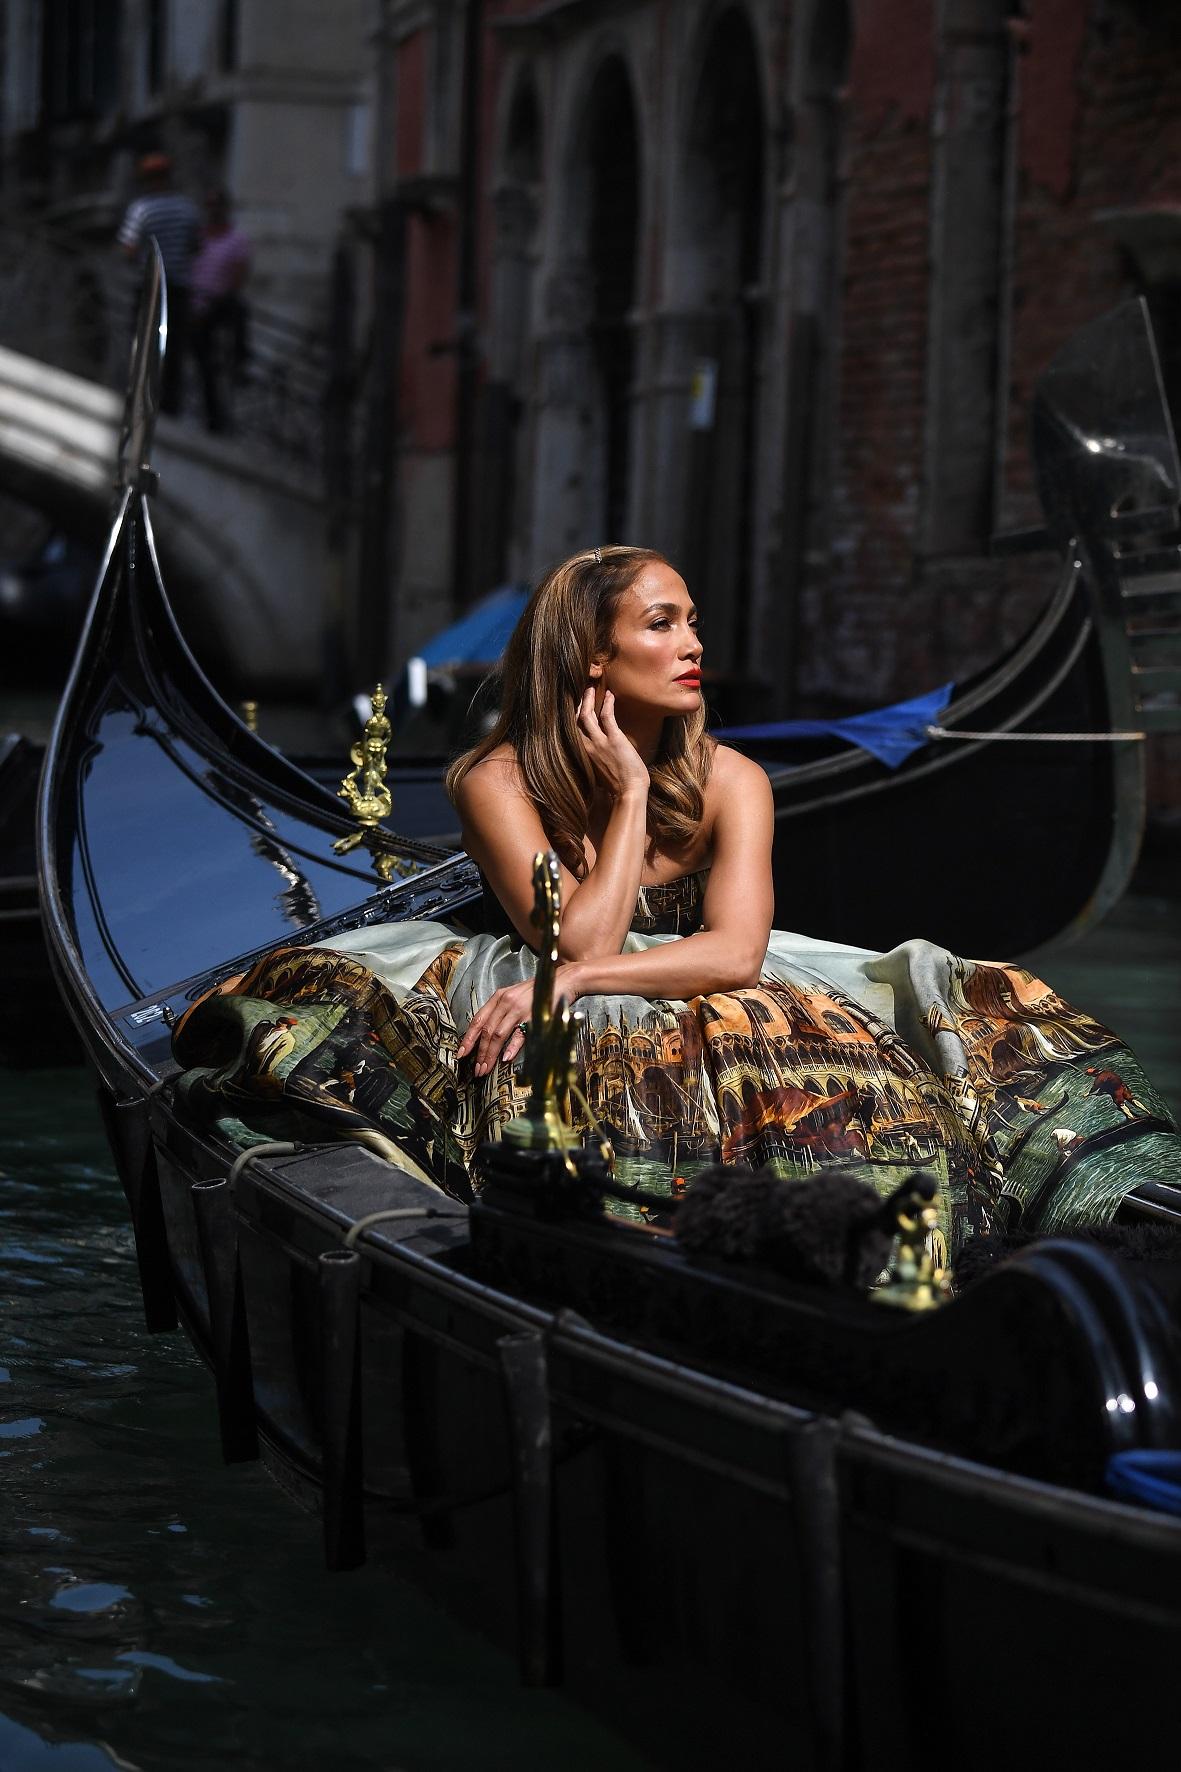 Jennifer Lopez climbs aboard a gondola ahead of a photoshoot for Dolce & Gabbana in Venice